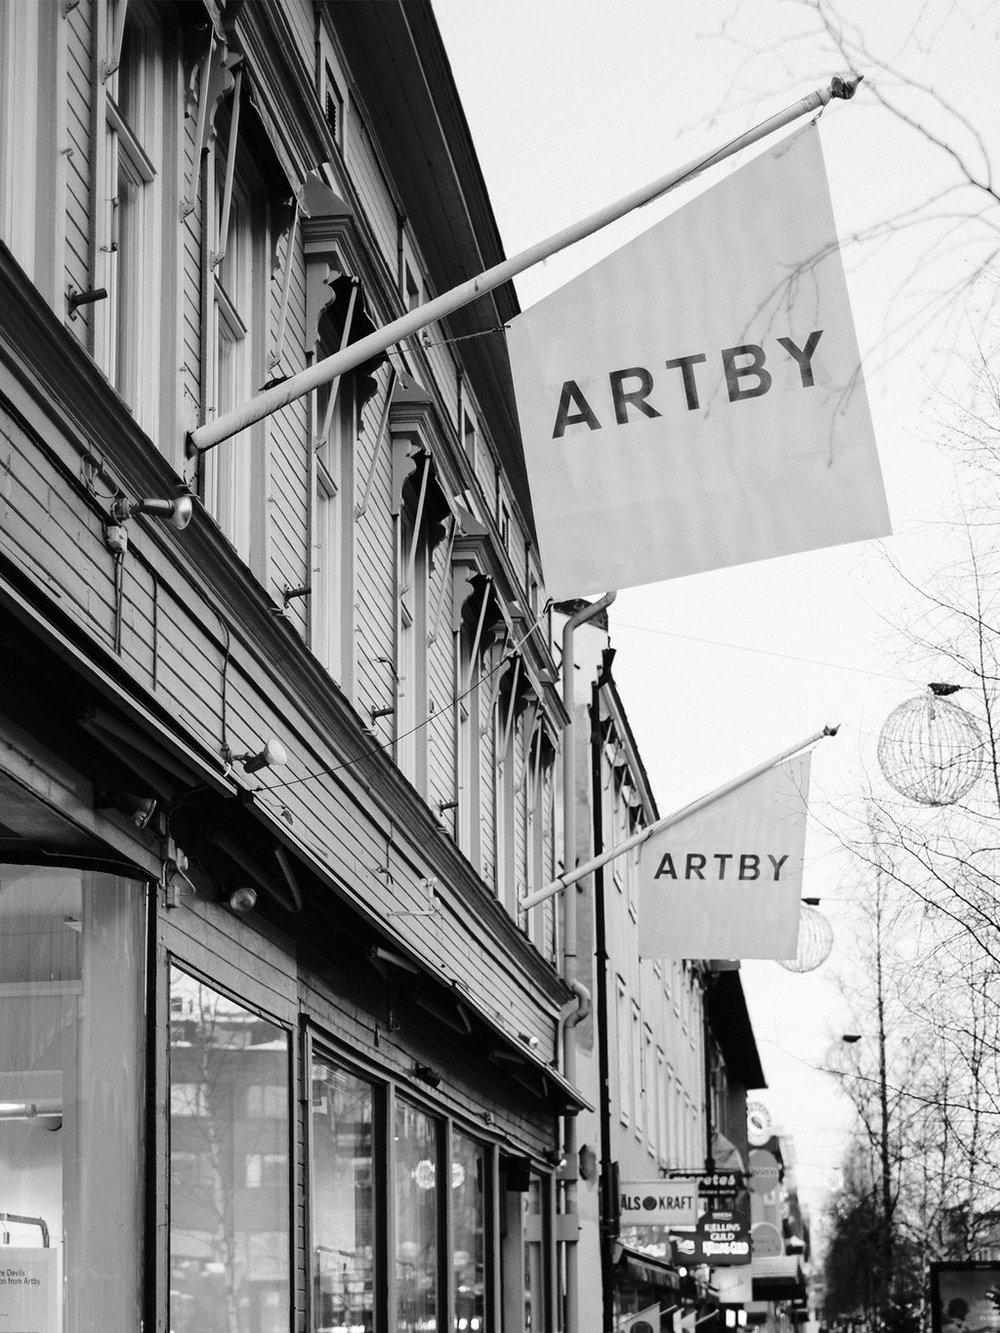 Artby